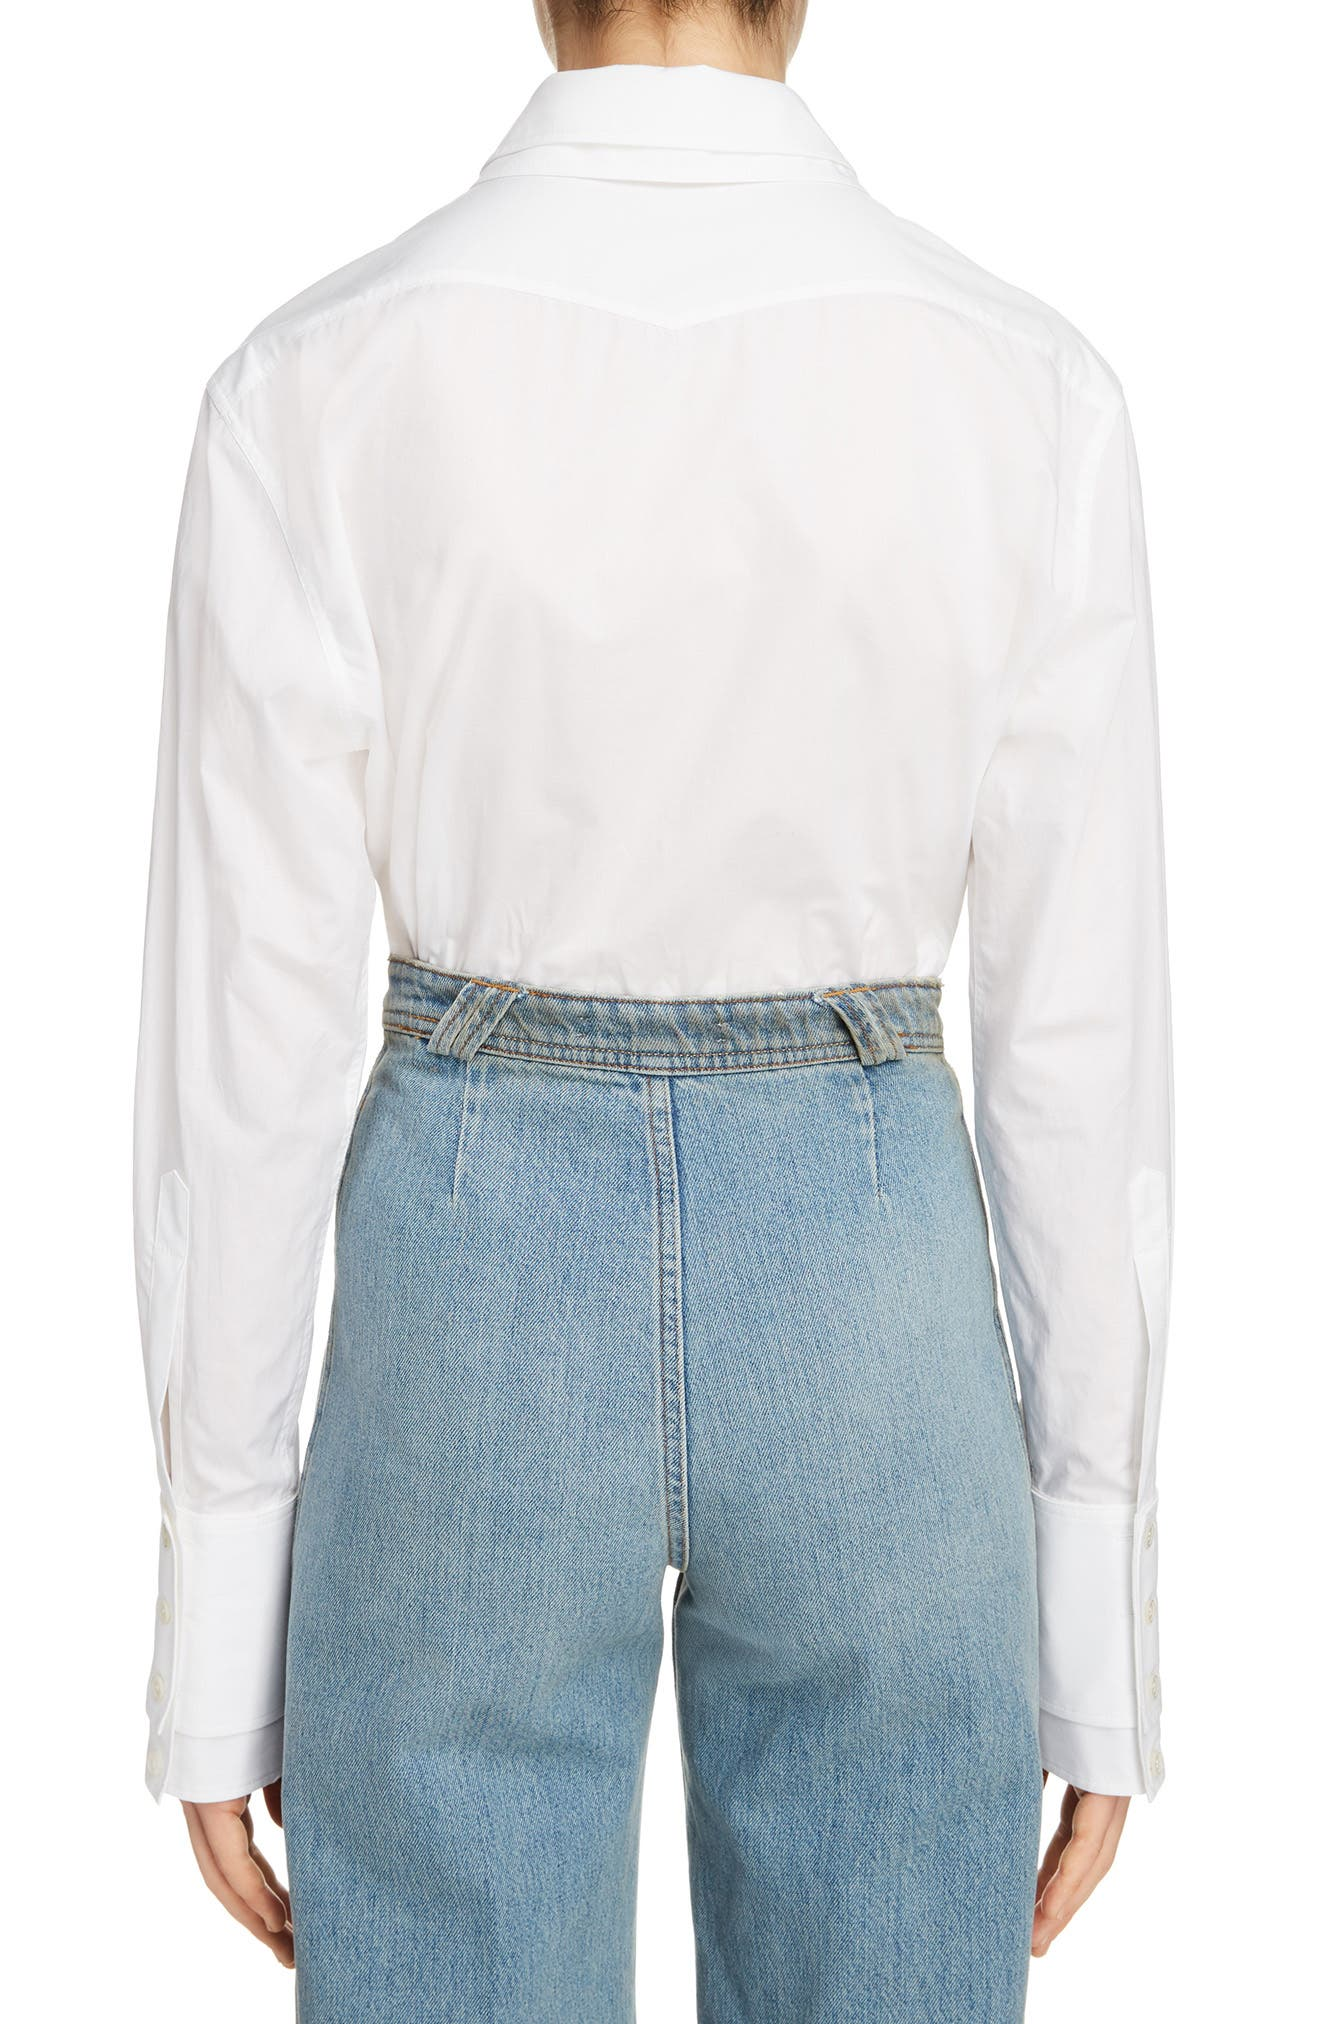 Roline Shirt,                             Alternate thumbnail 2, color,                             100